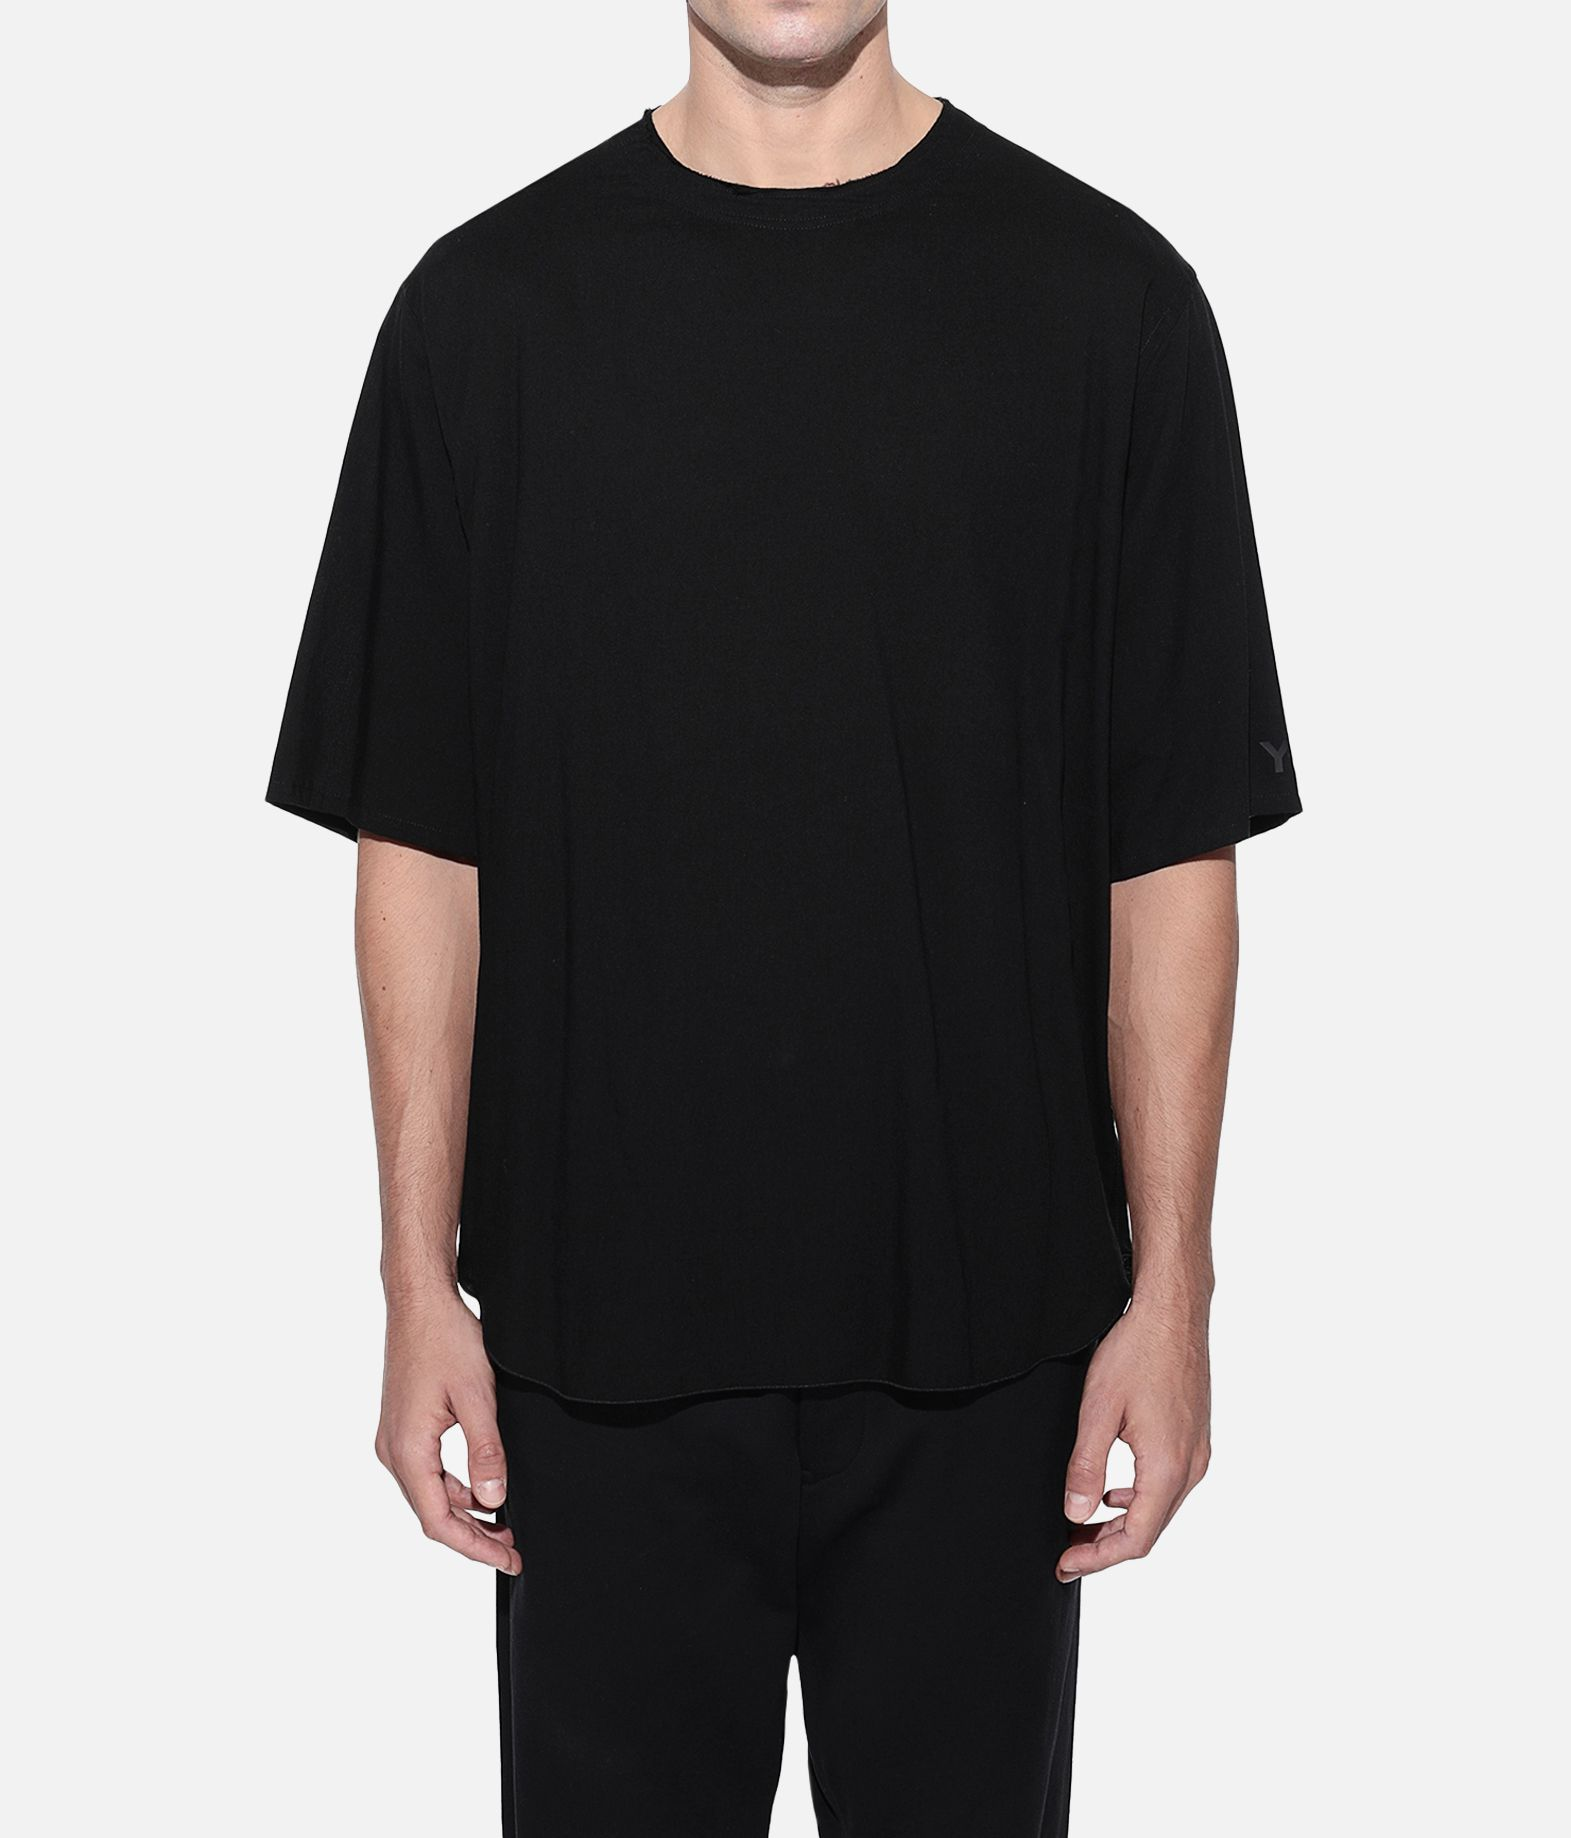 Y-3 Y-3 Long Tee  T-shirt maniche corte Uomo r